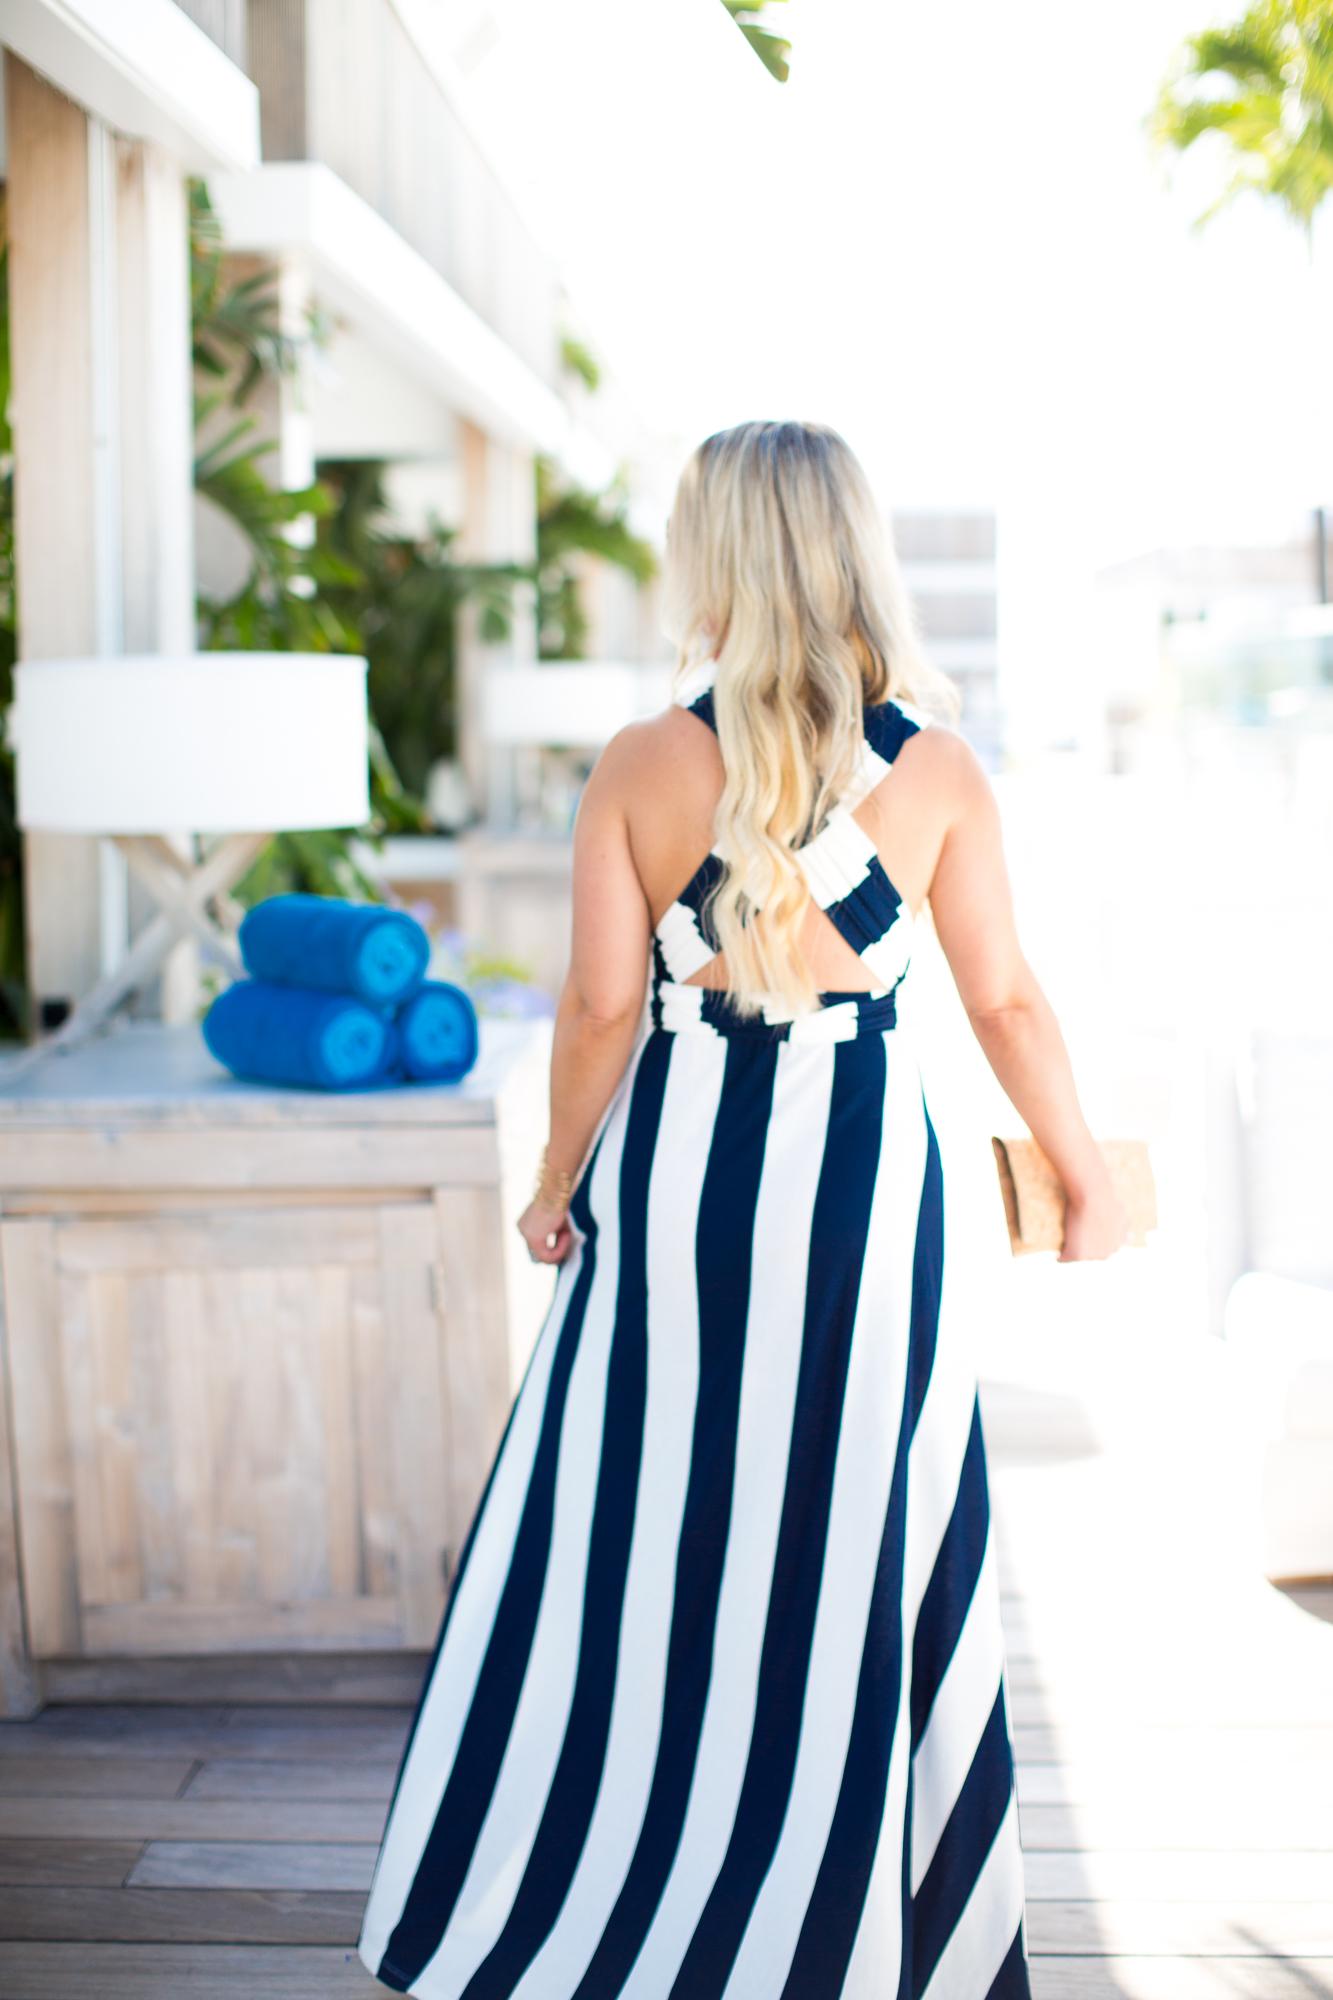 Nautical Striped Dress | The Darling Petite Diva | Nicole Kirk | Dallas Blogger